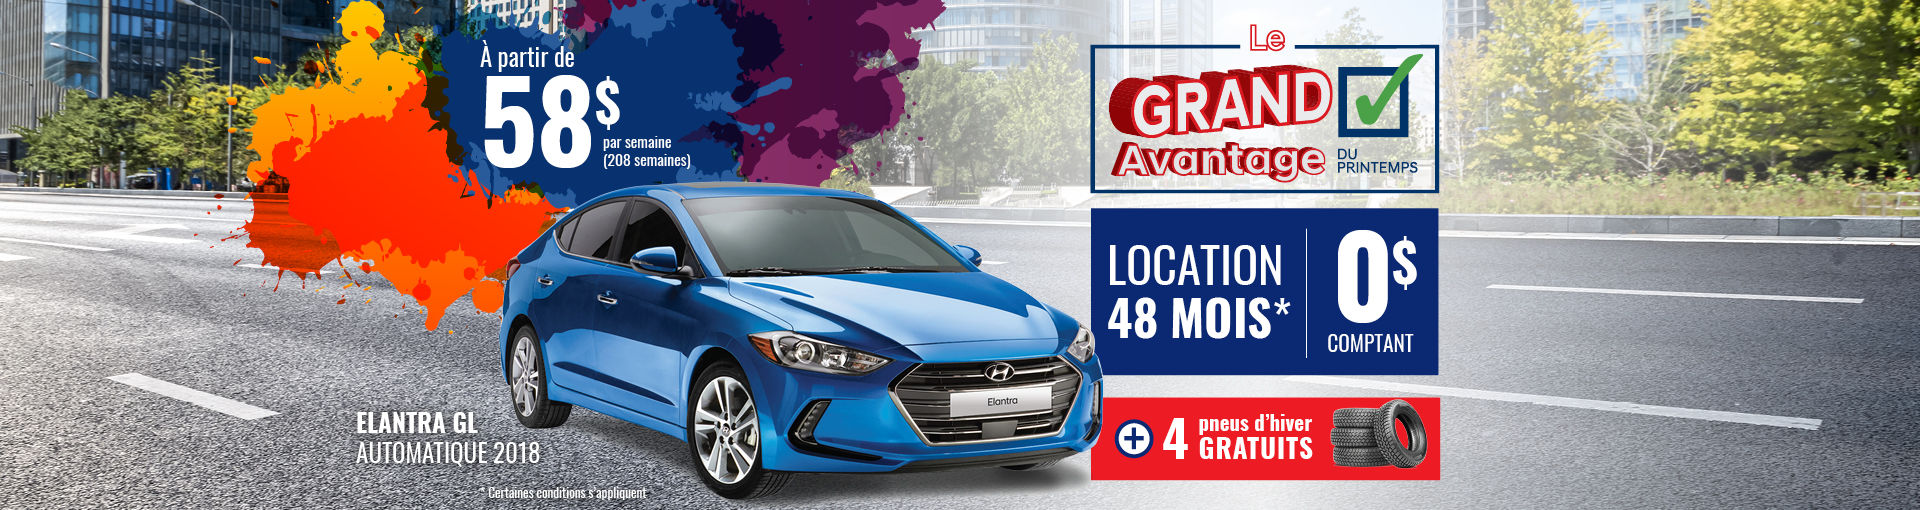 Promo Hyundai Casavant mars 2018-Elantra GL 2018